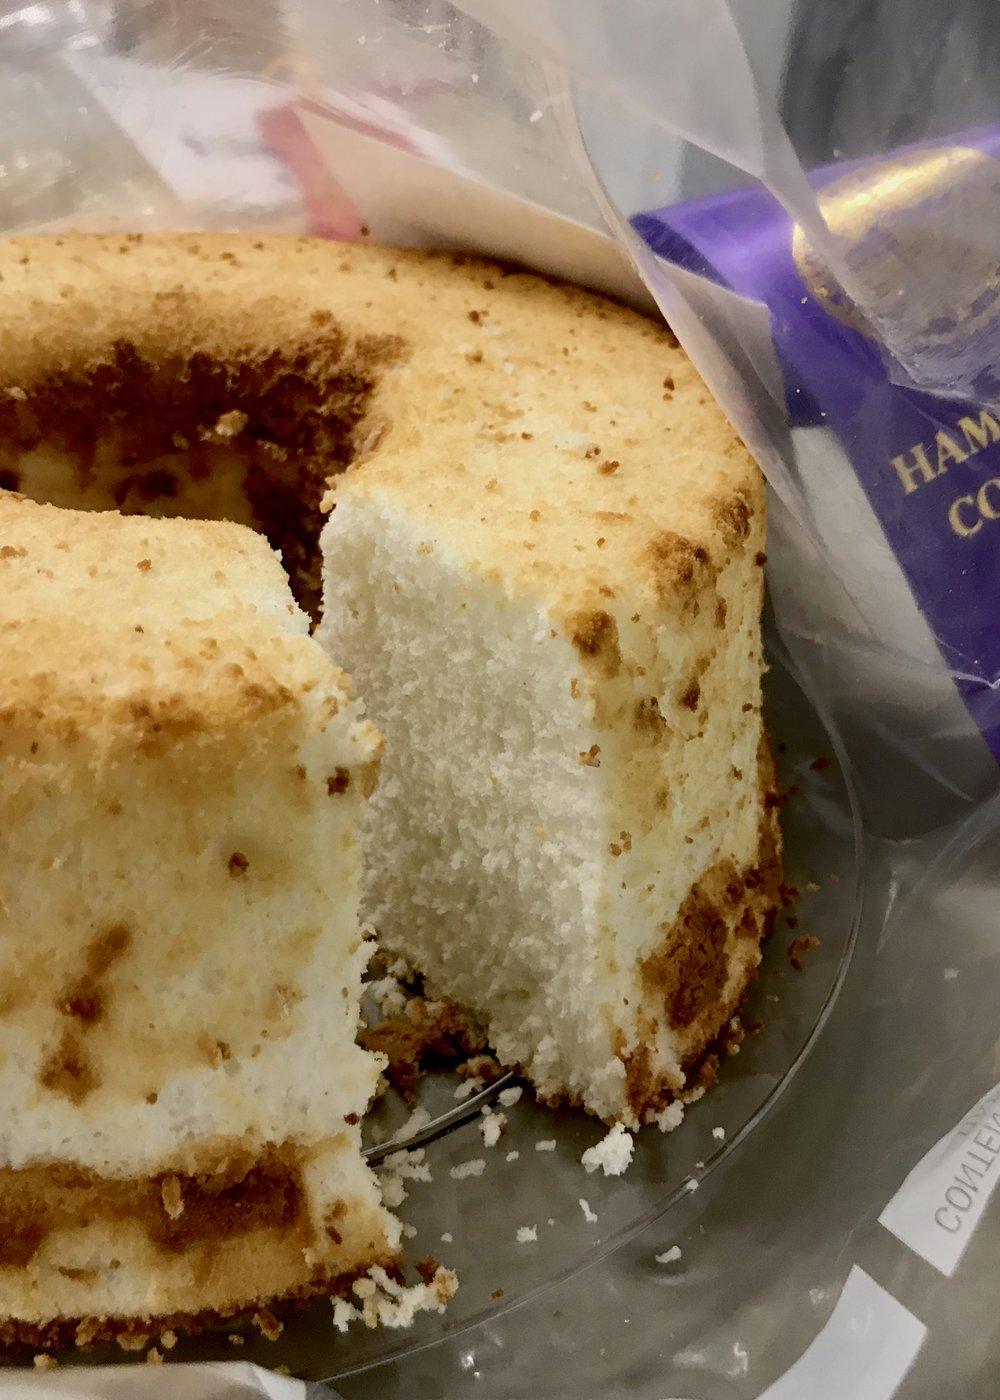 Angel Food Cake at the Hamilton County 4-H Recipe Challenge. Photo credit: Anita McVey